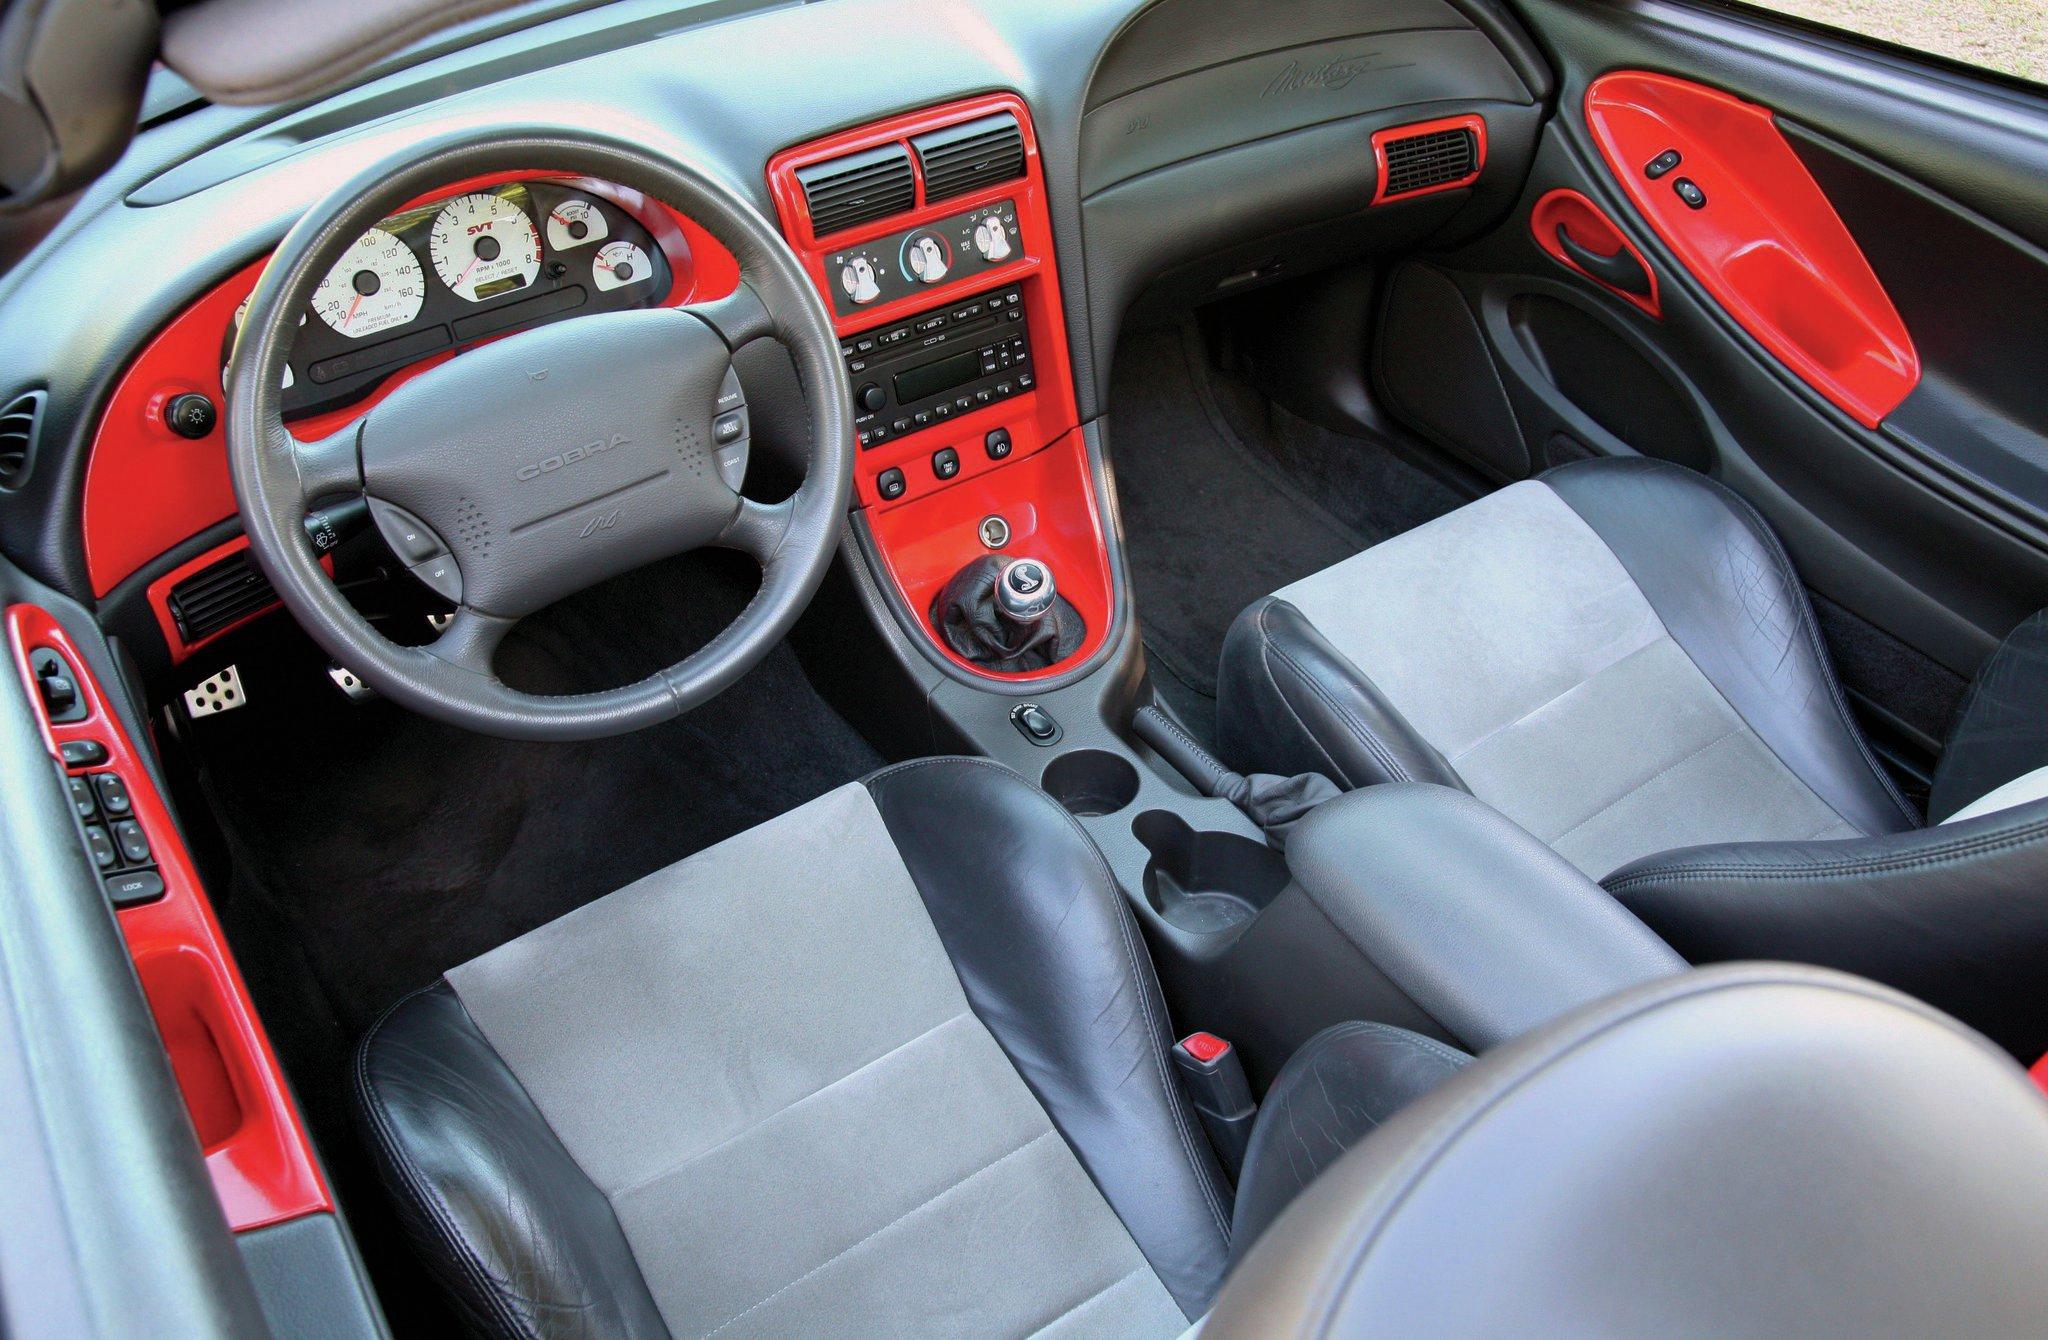 2003 Ford Mustang Cobra Interior